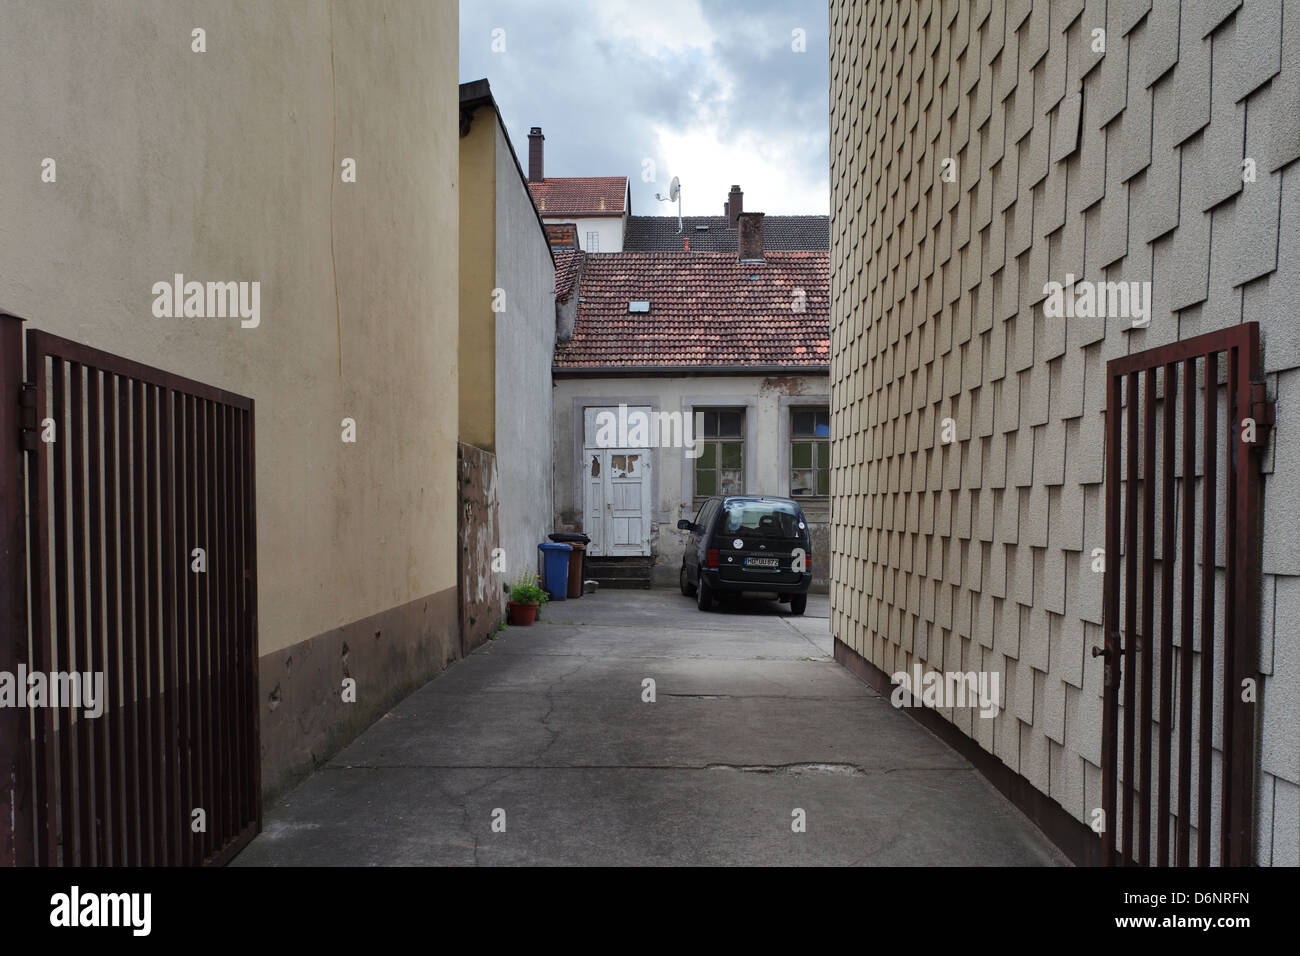 Pirmasens, Germany, backyard and parking car in Pirmasens - Stock Image